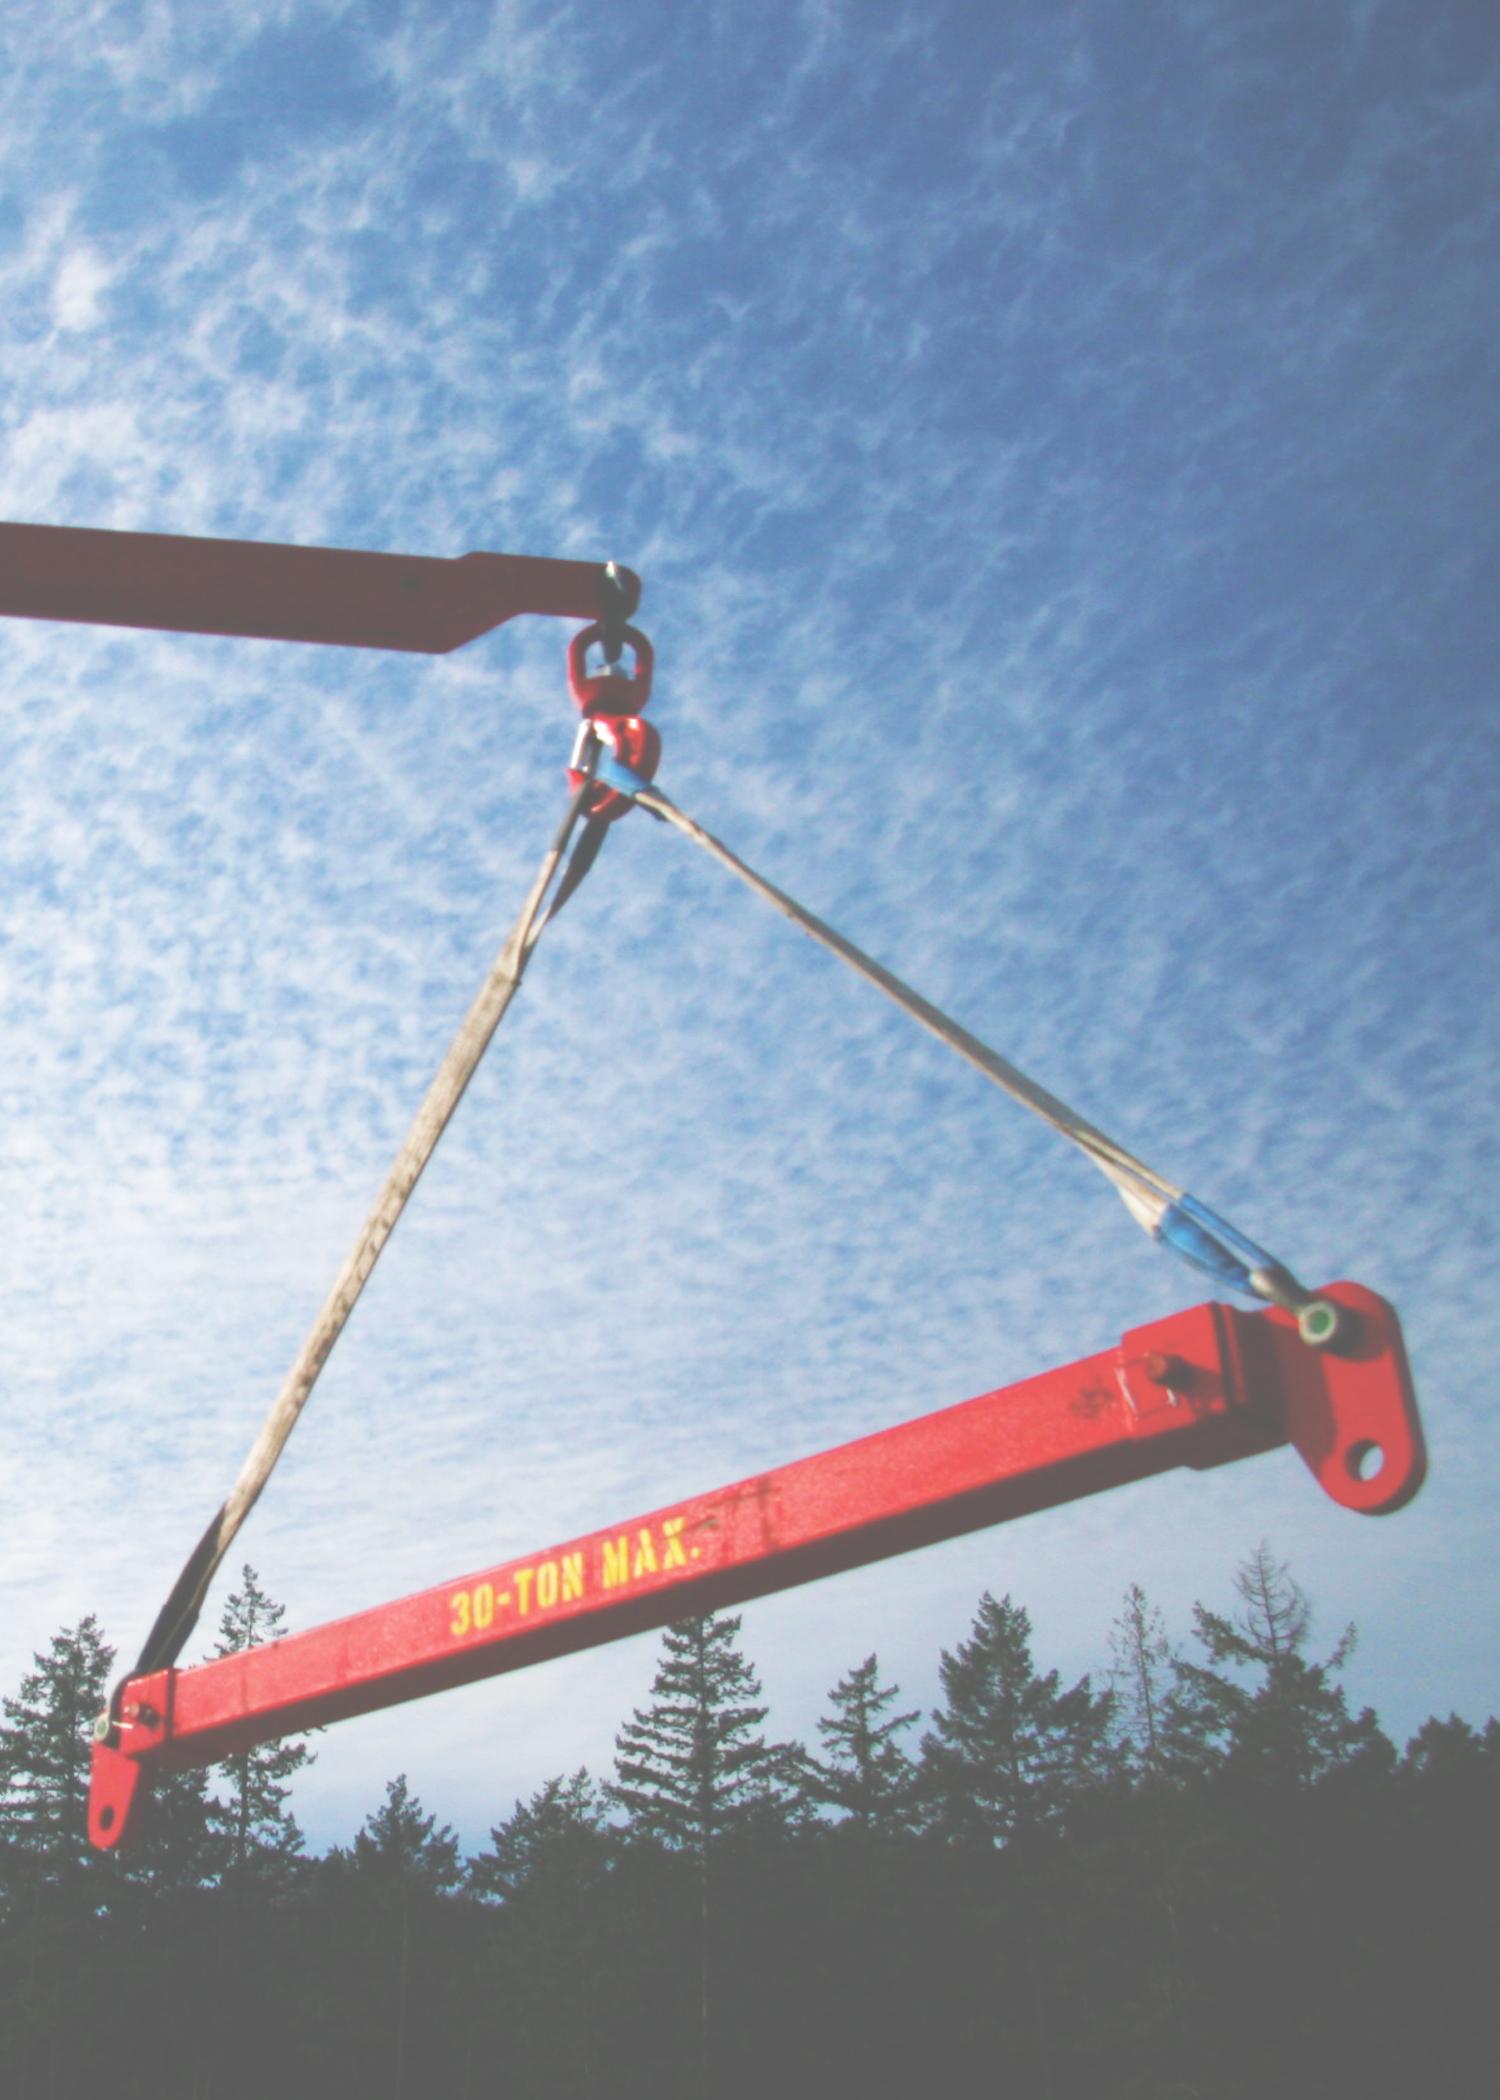 spreader bar, a picker truck, palfinger, crane, lifting, solos